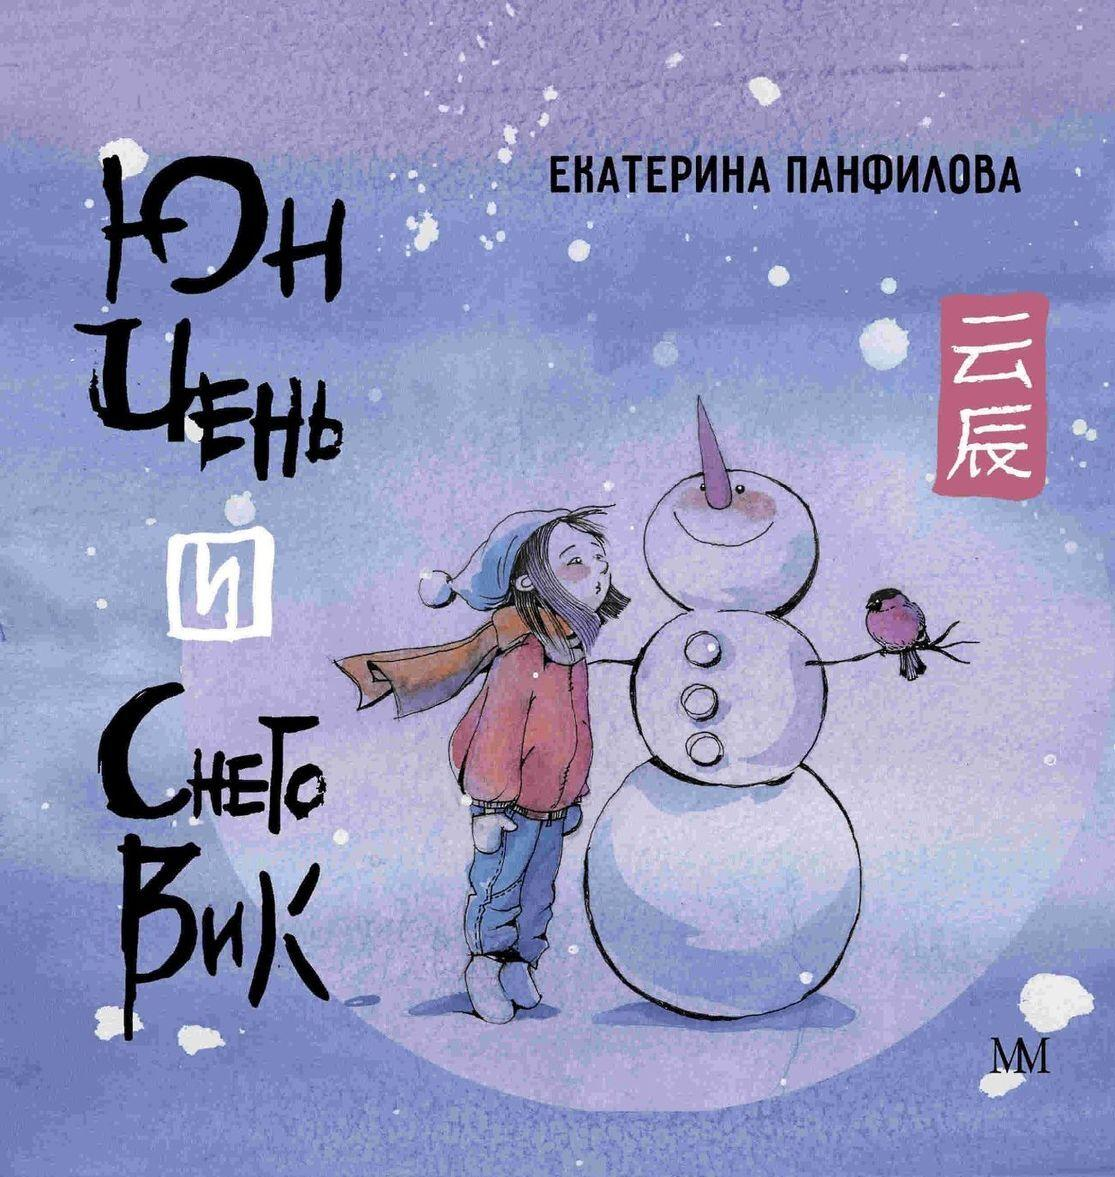 Юн Чень и Снеговик